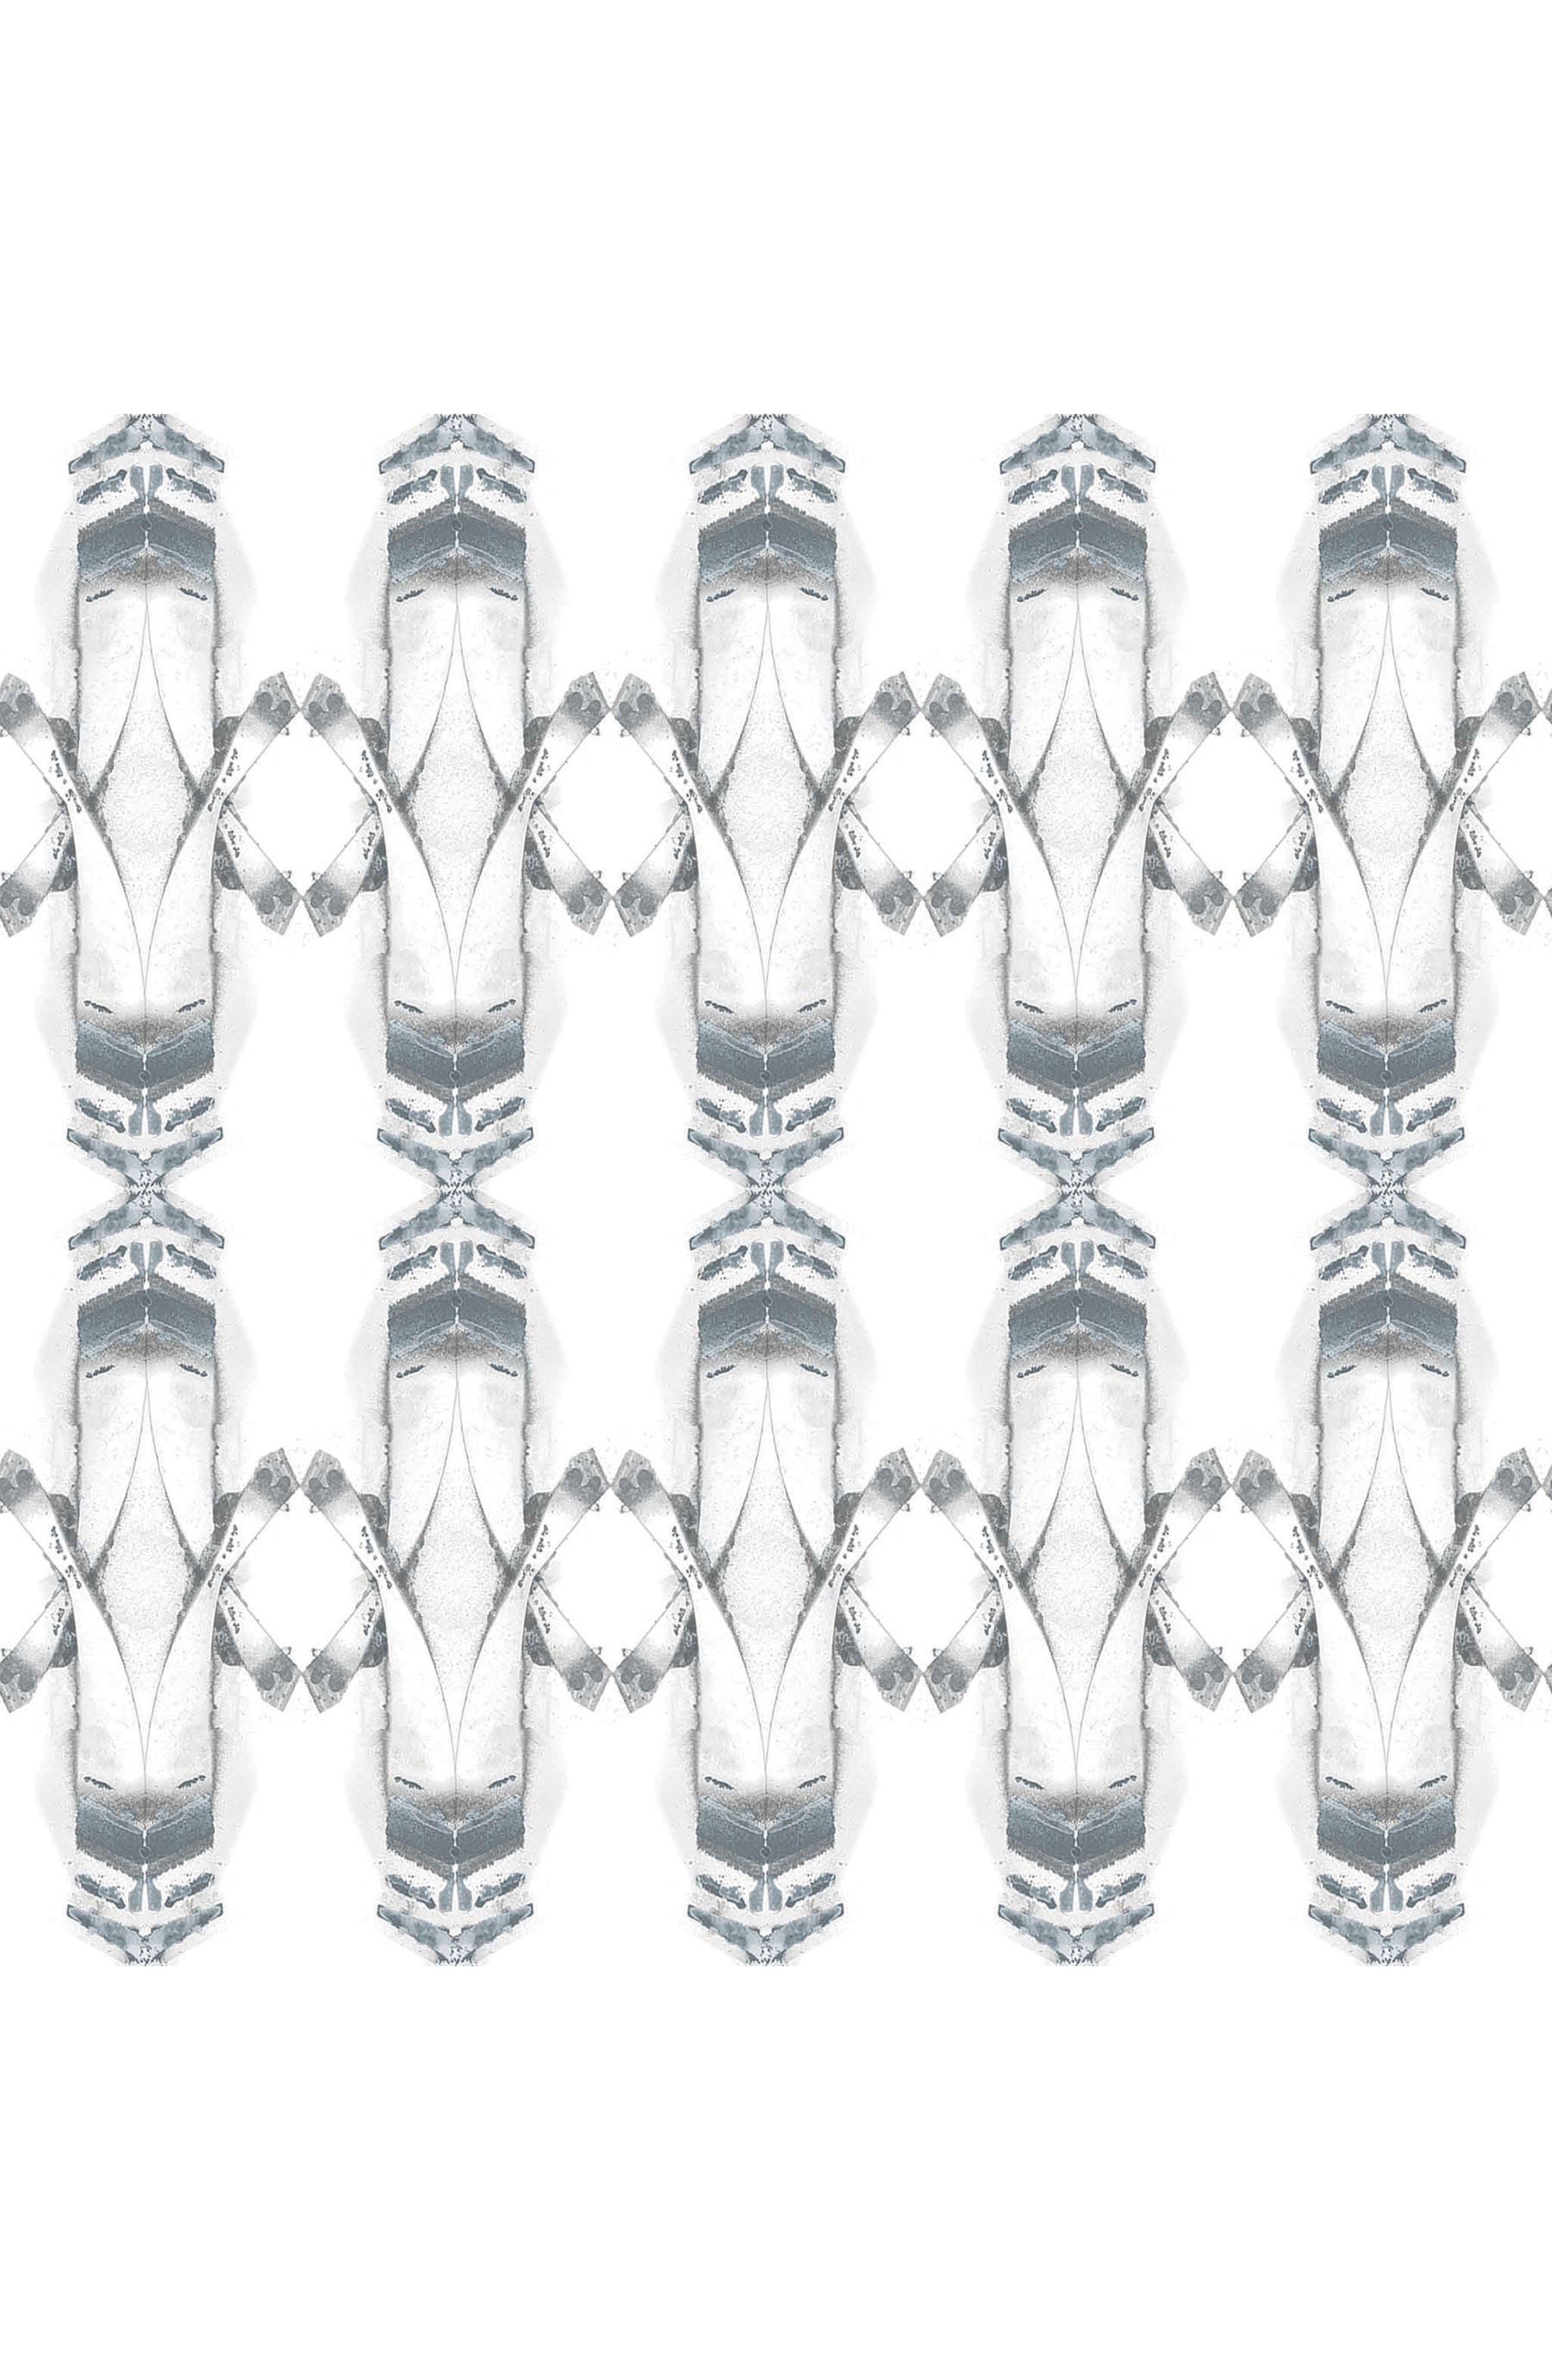 Kaleidoscope Self-Adhesive Vinyl Wallpaper,                             Main thumbnail 1, color,                             020